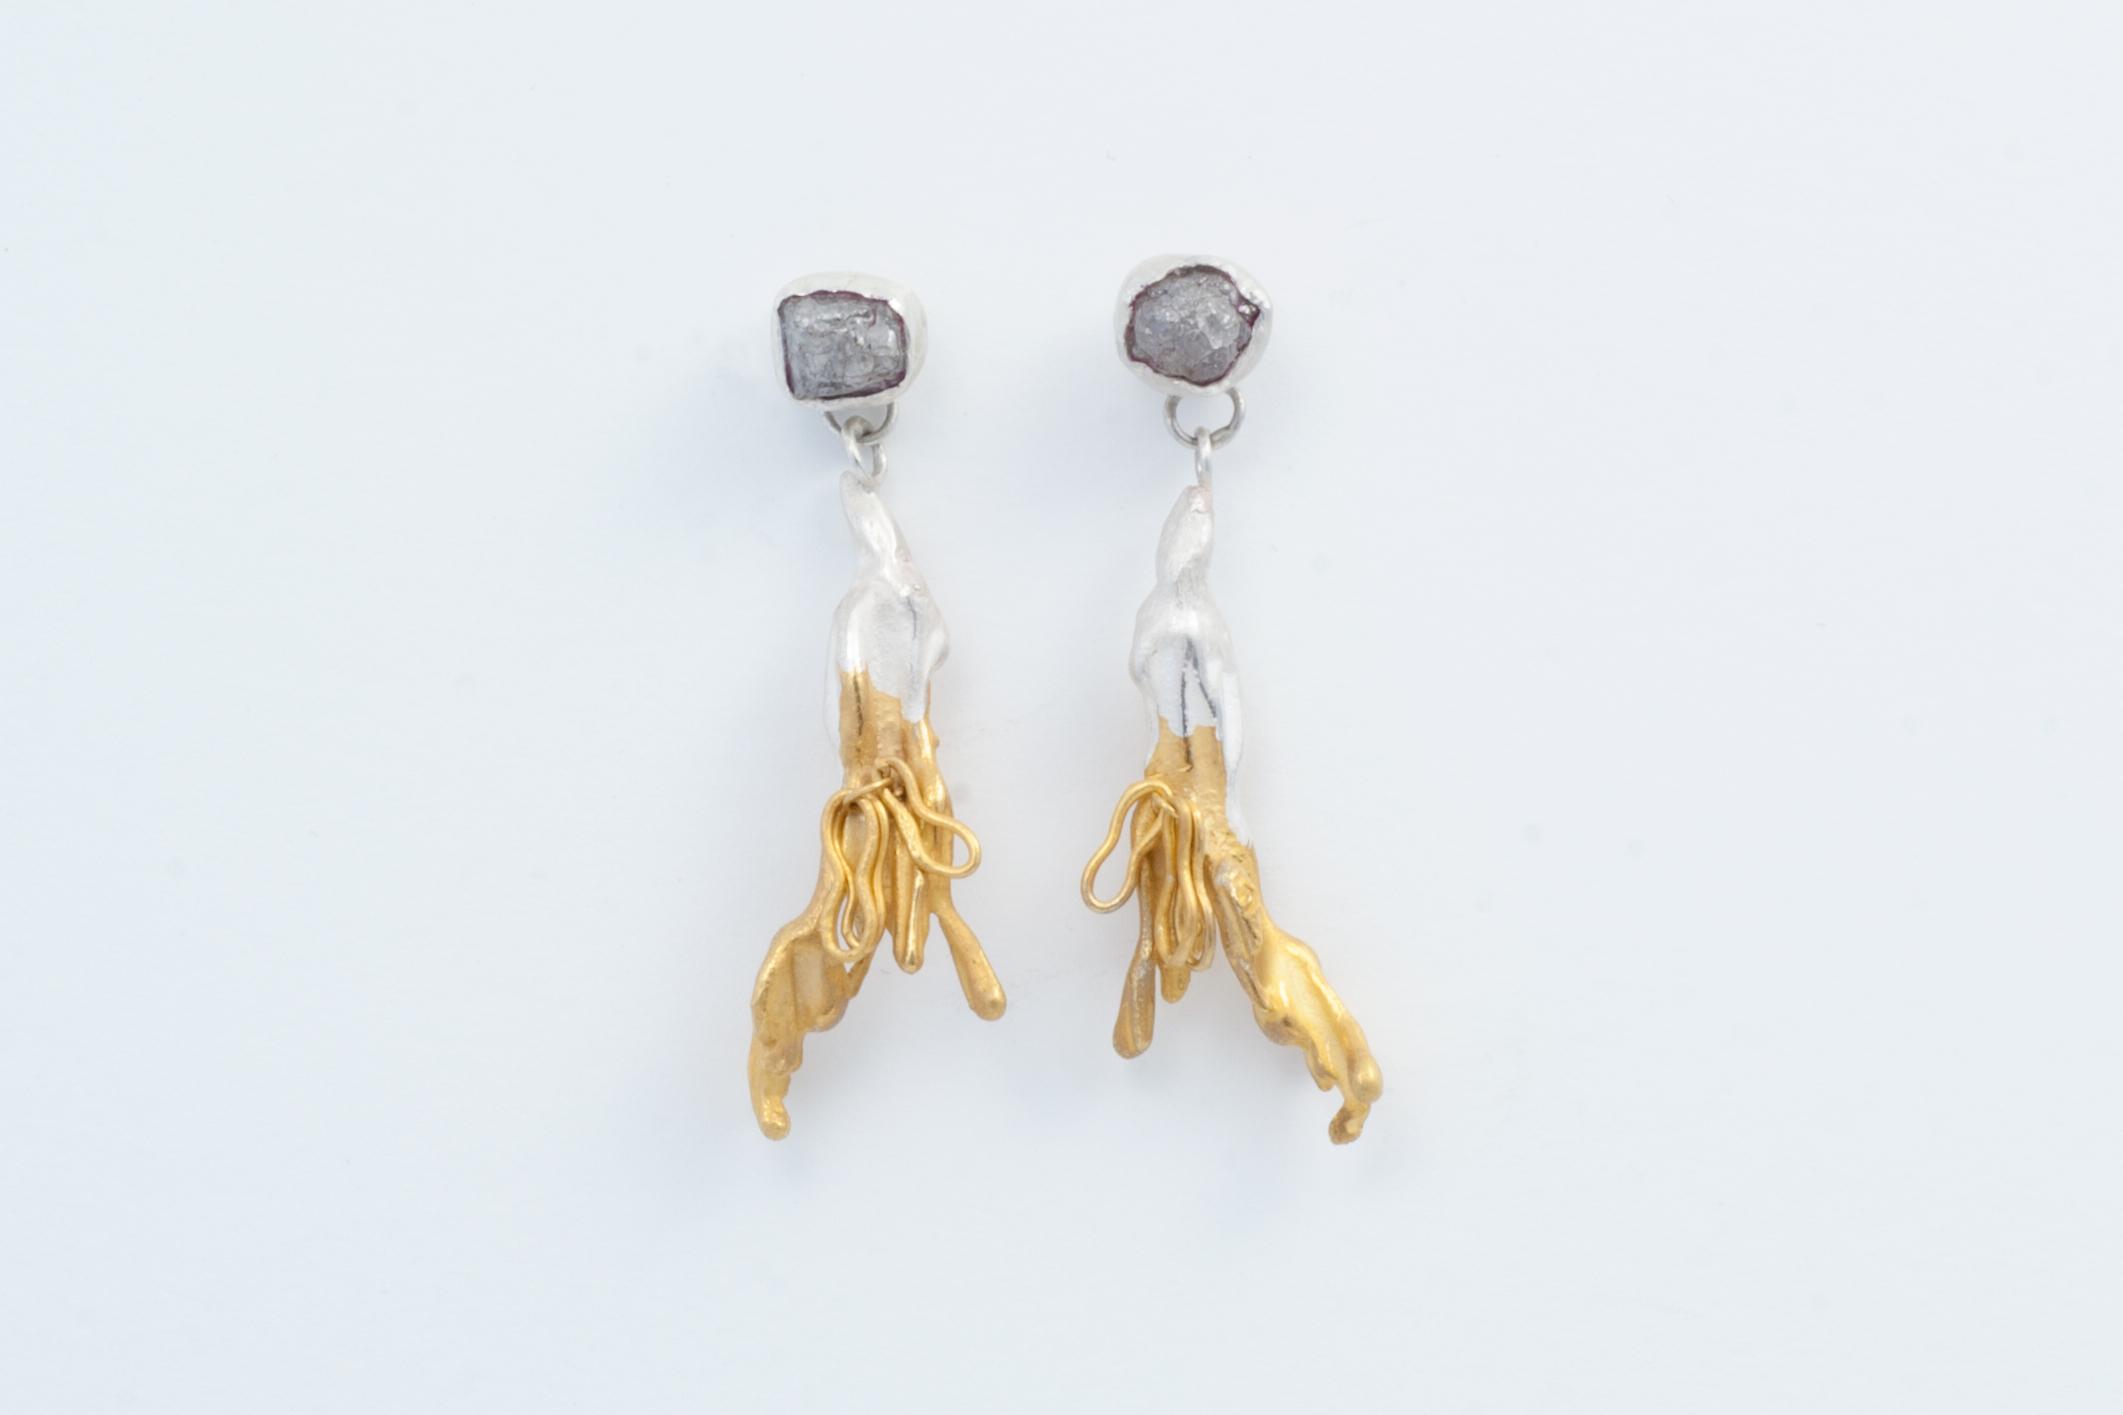 gold-dipped-diamond-earrings-2-web.jpg